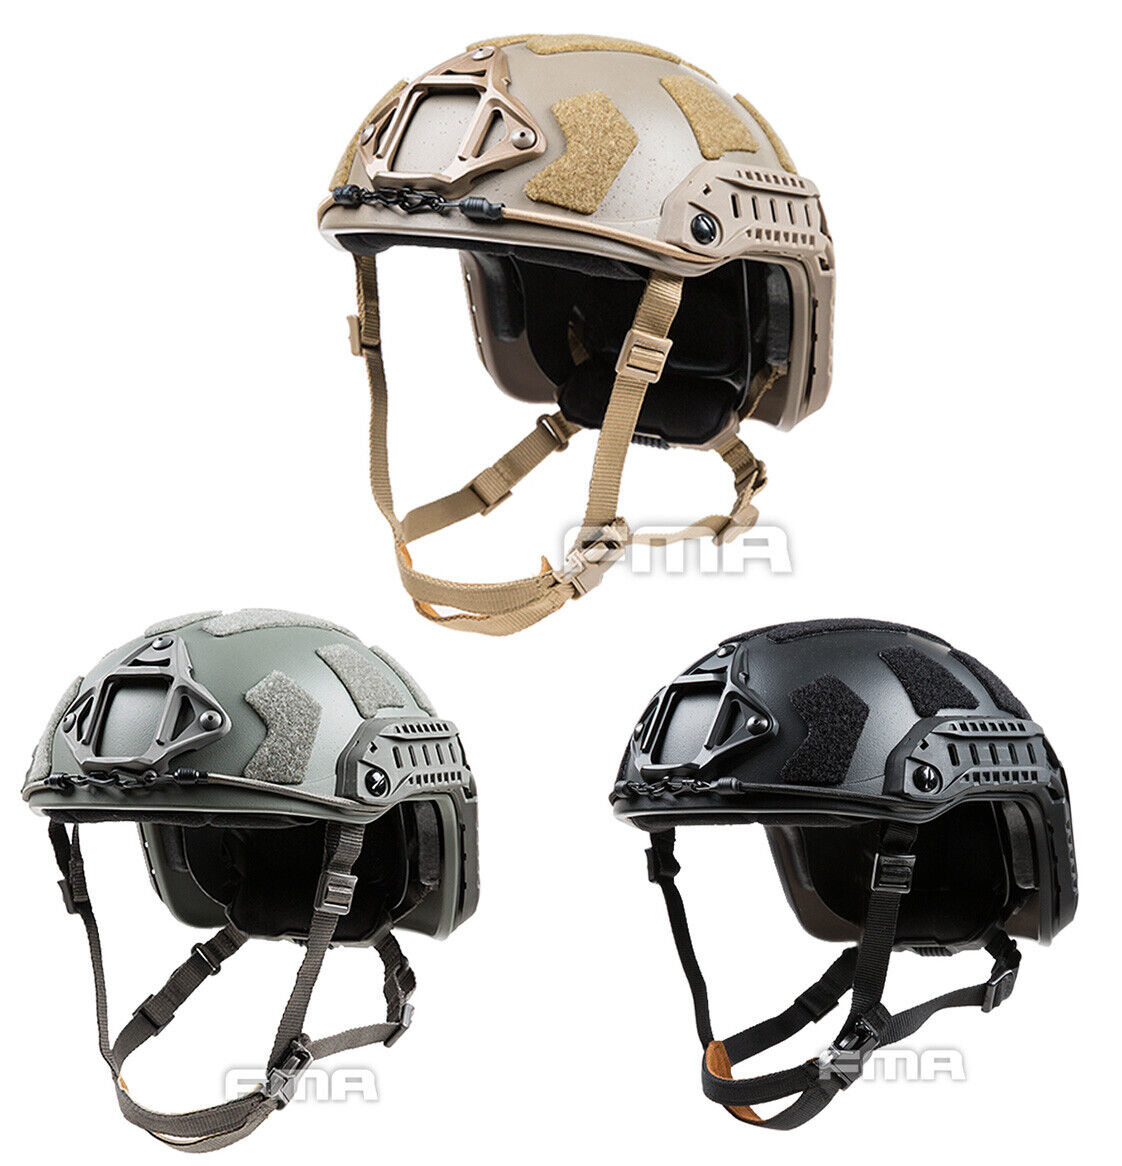 FMA SF Super Corte casco táctico airsoft paintball High TB1315B M L Negro   fija de engranaje DE